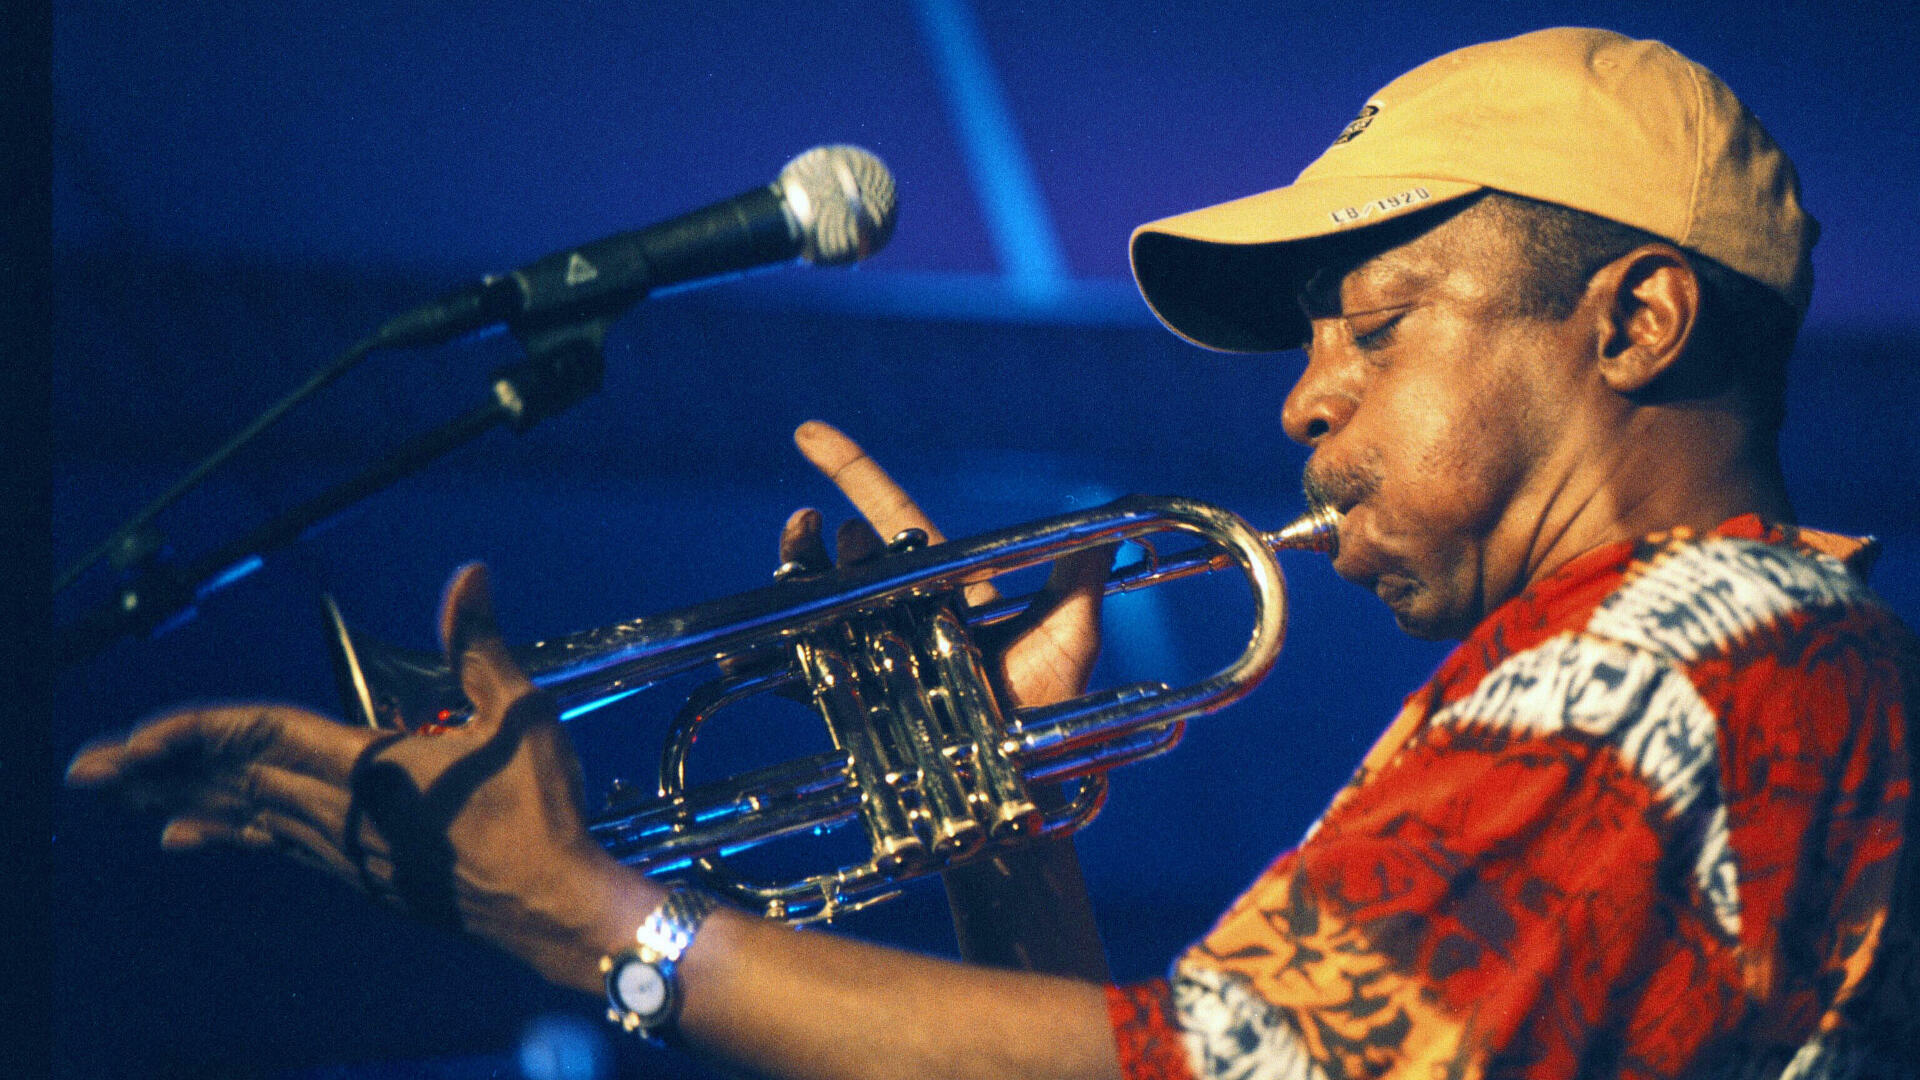 Olu Dara trompettiste festival North sea Jazz La Hague 2001